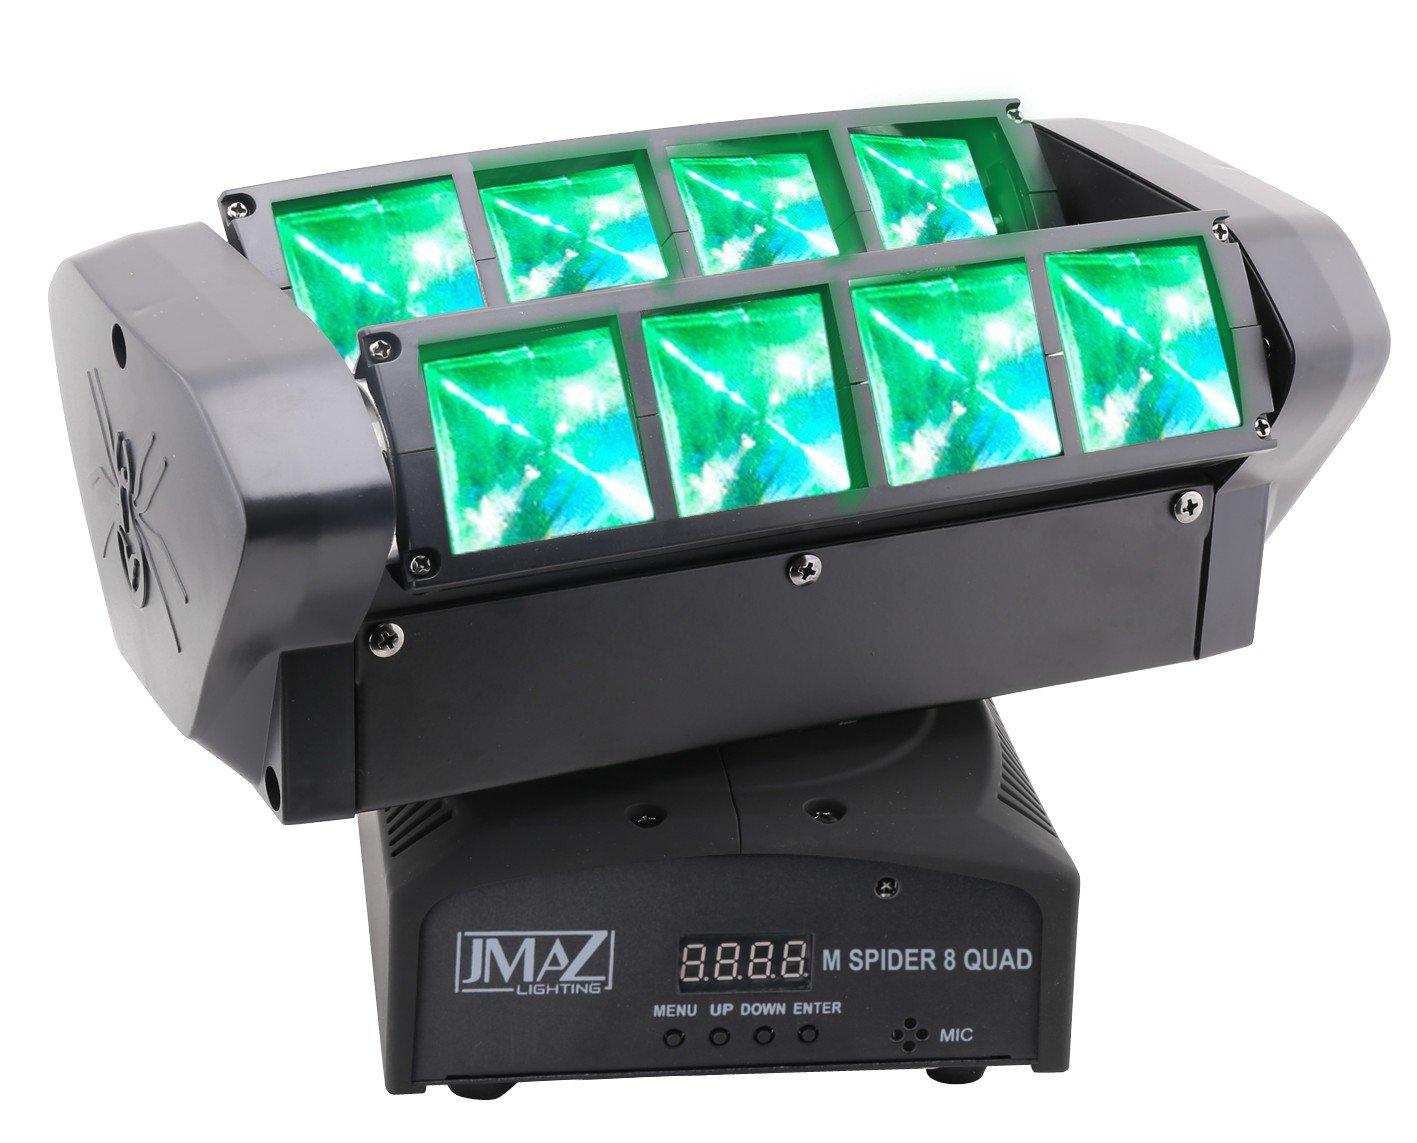 JMAZ M Spider 8 Quad Moving Head Light 8 x 12W RGBW Quad LED DMX512 For Stage Light Disco DJ Church Wedding Party Show Live Concert Lighting by JMAZ